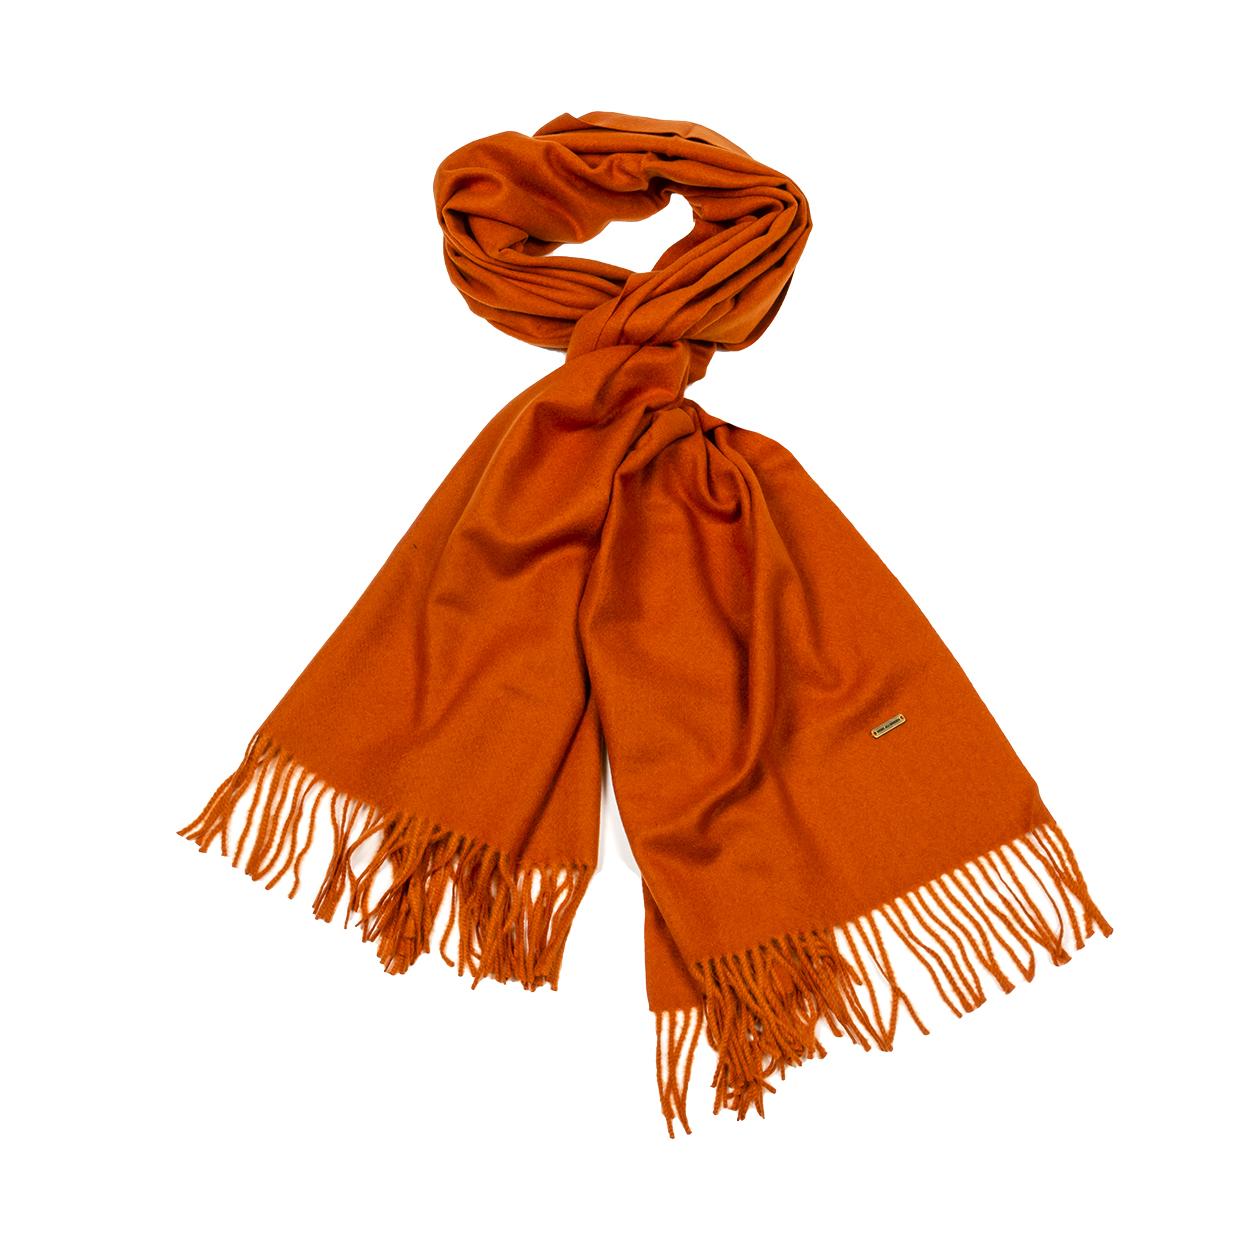 Echarpe  occitan orange